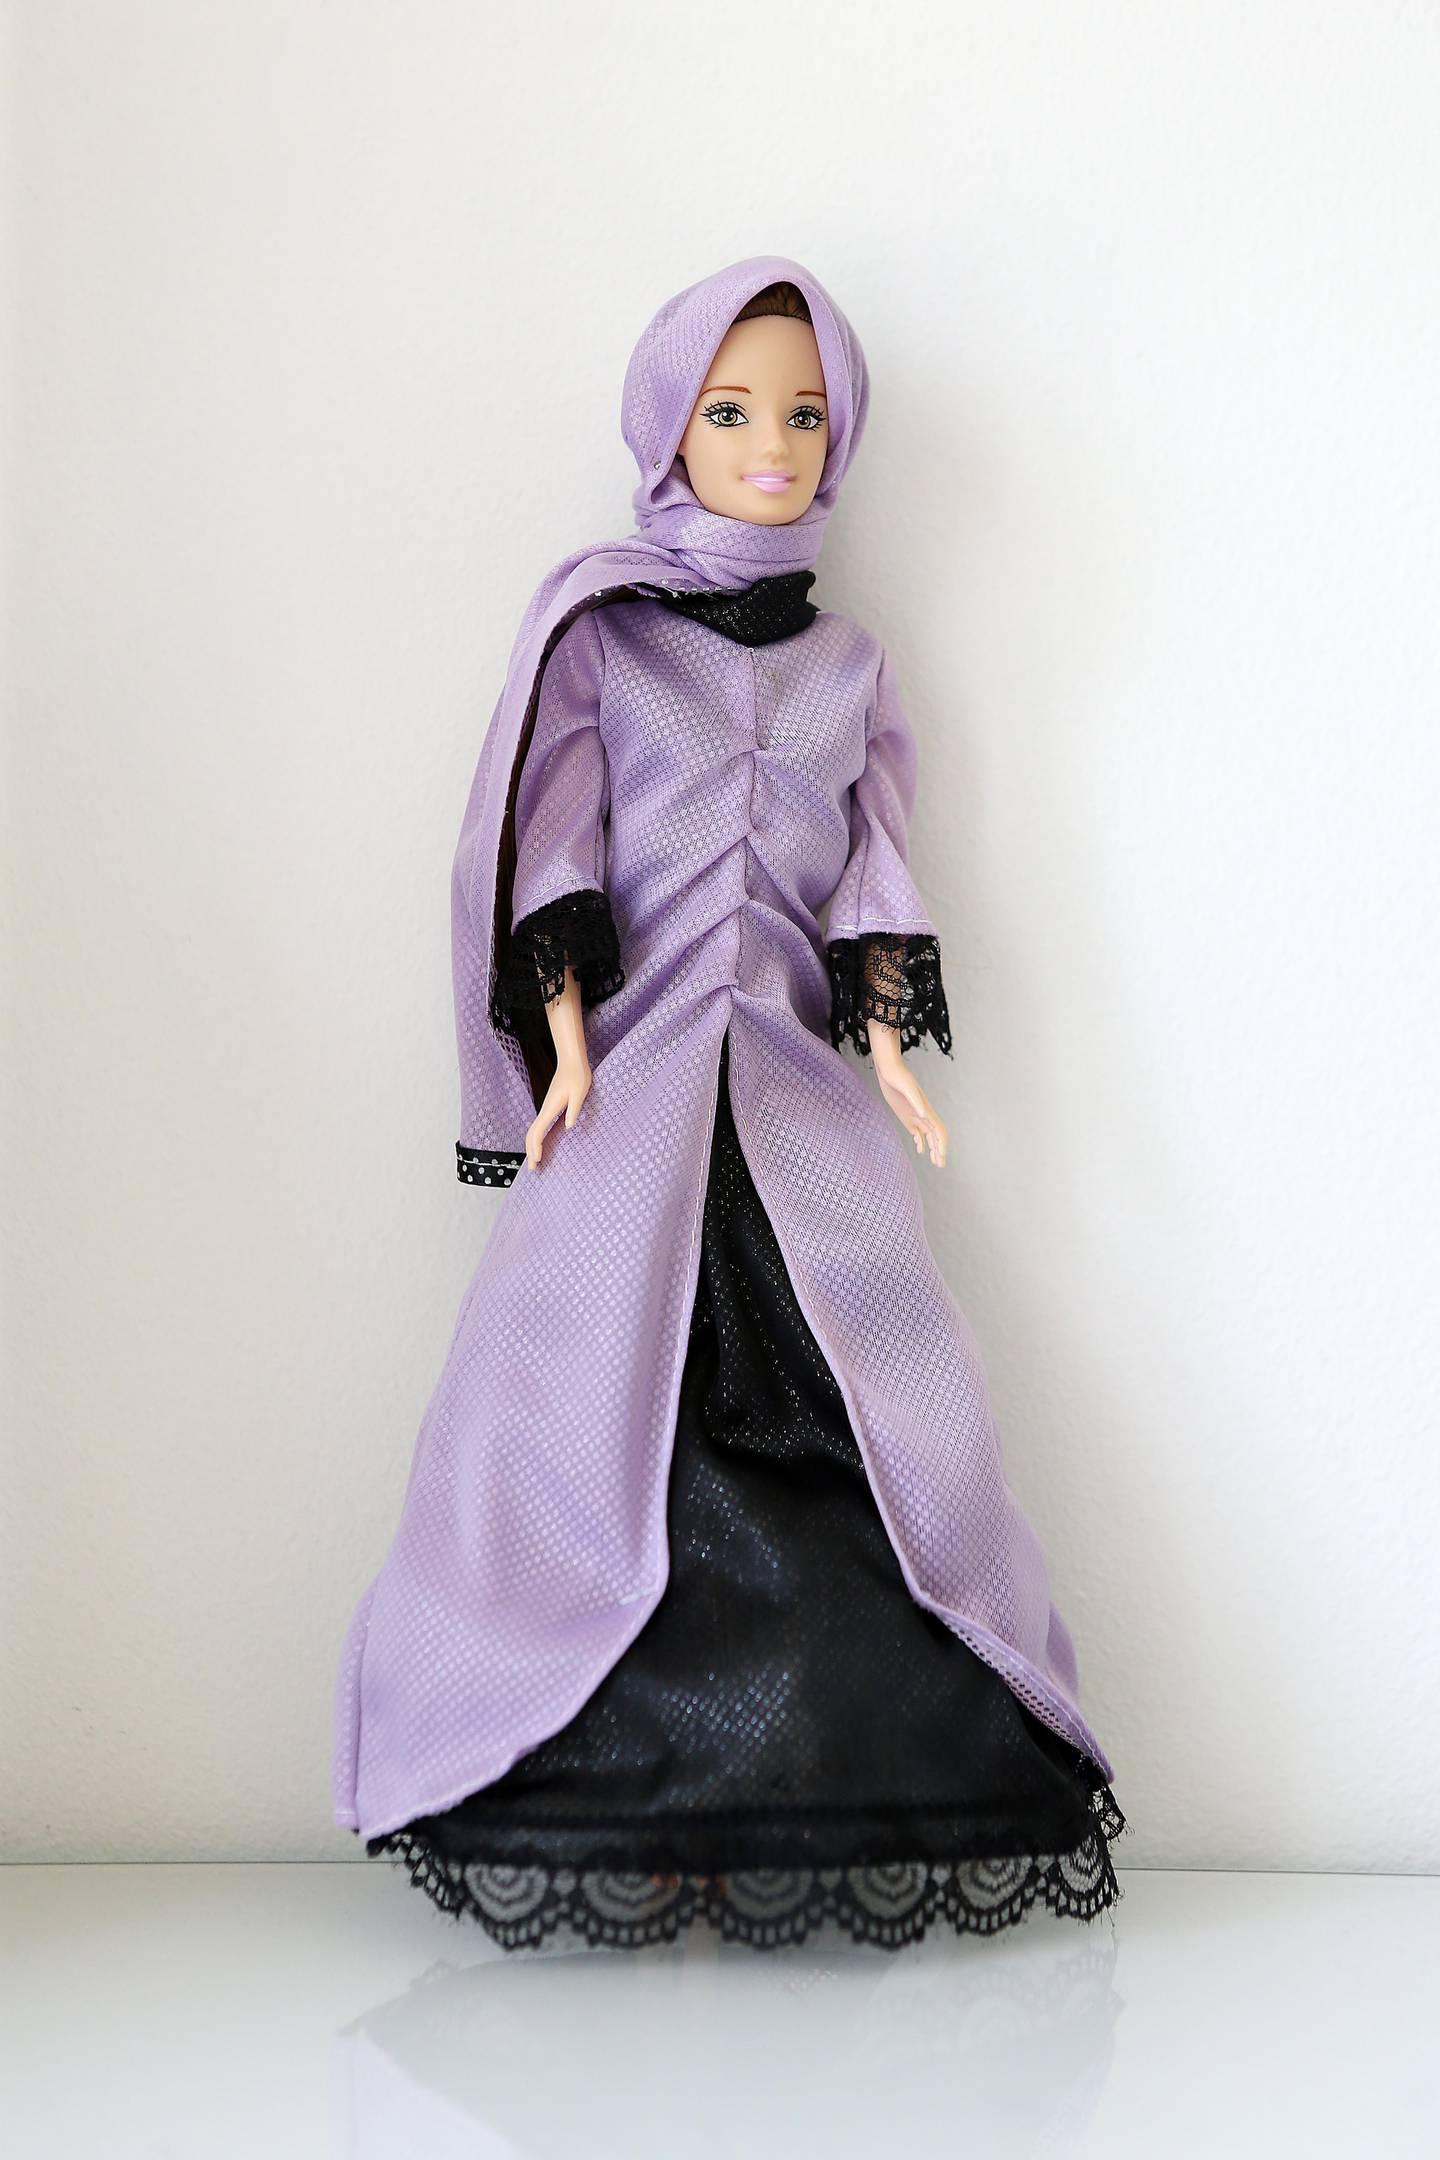 DUBAI , UNITED ARAB EMIRATES , JULY 19  – 2017 :- Jenna the Quran teacher doll designed by French woman Samira Amarir at her home in Jumeirah Beach Residence in Dubai. ( Pawan Singh / The National ) Story by Anna Zacharias